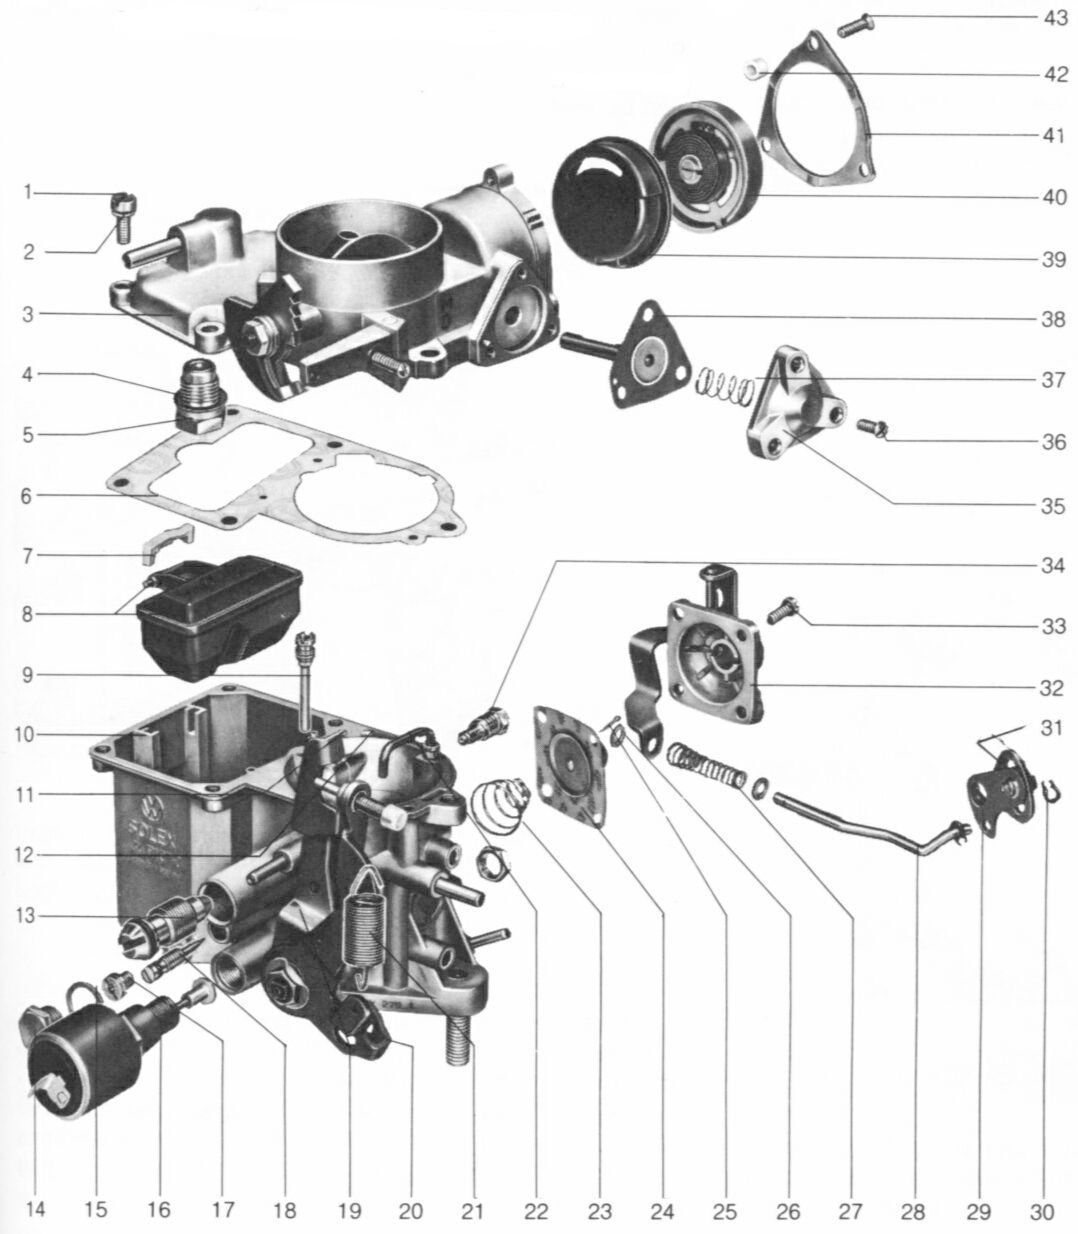 34 Pict 3 Carburetor Overhaul